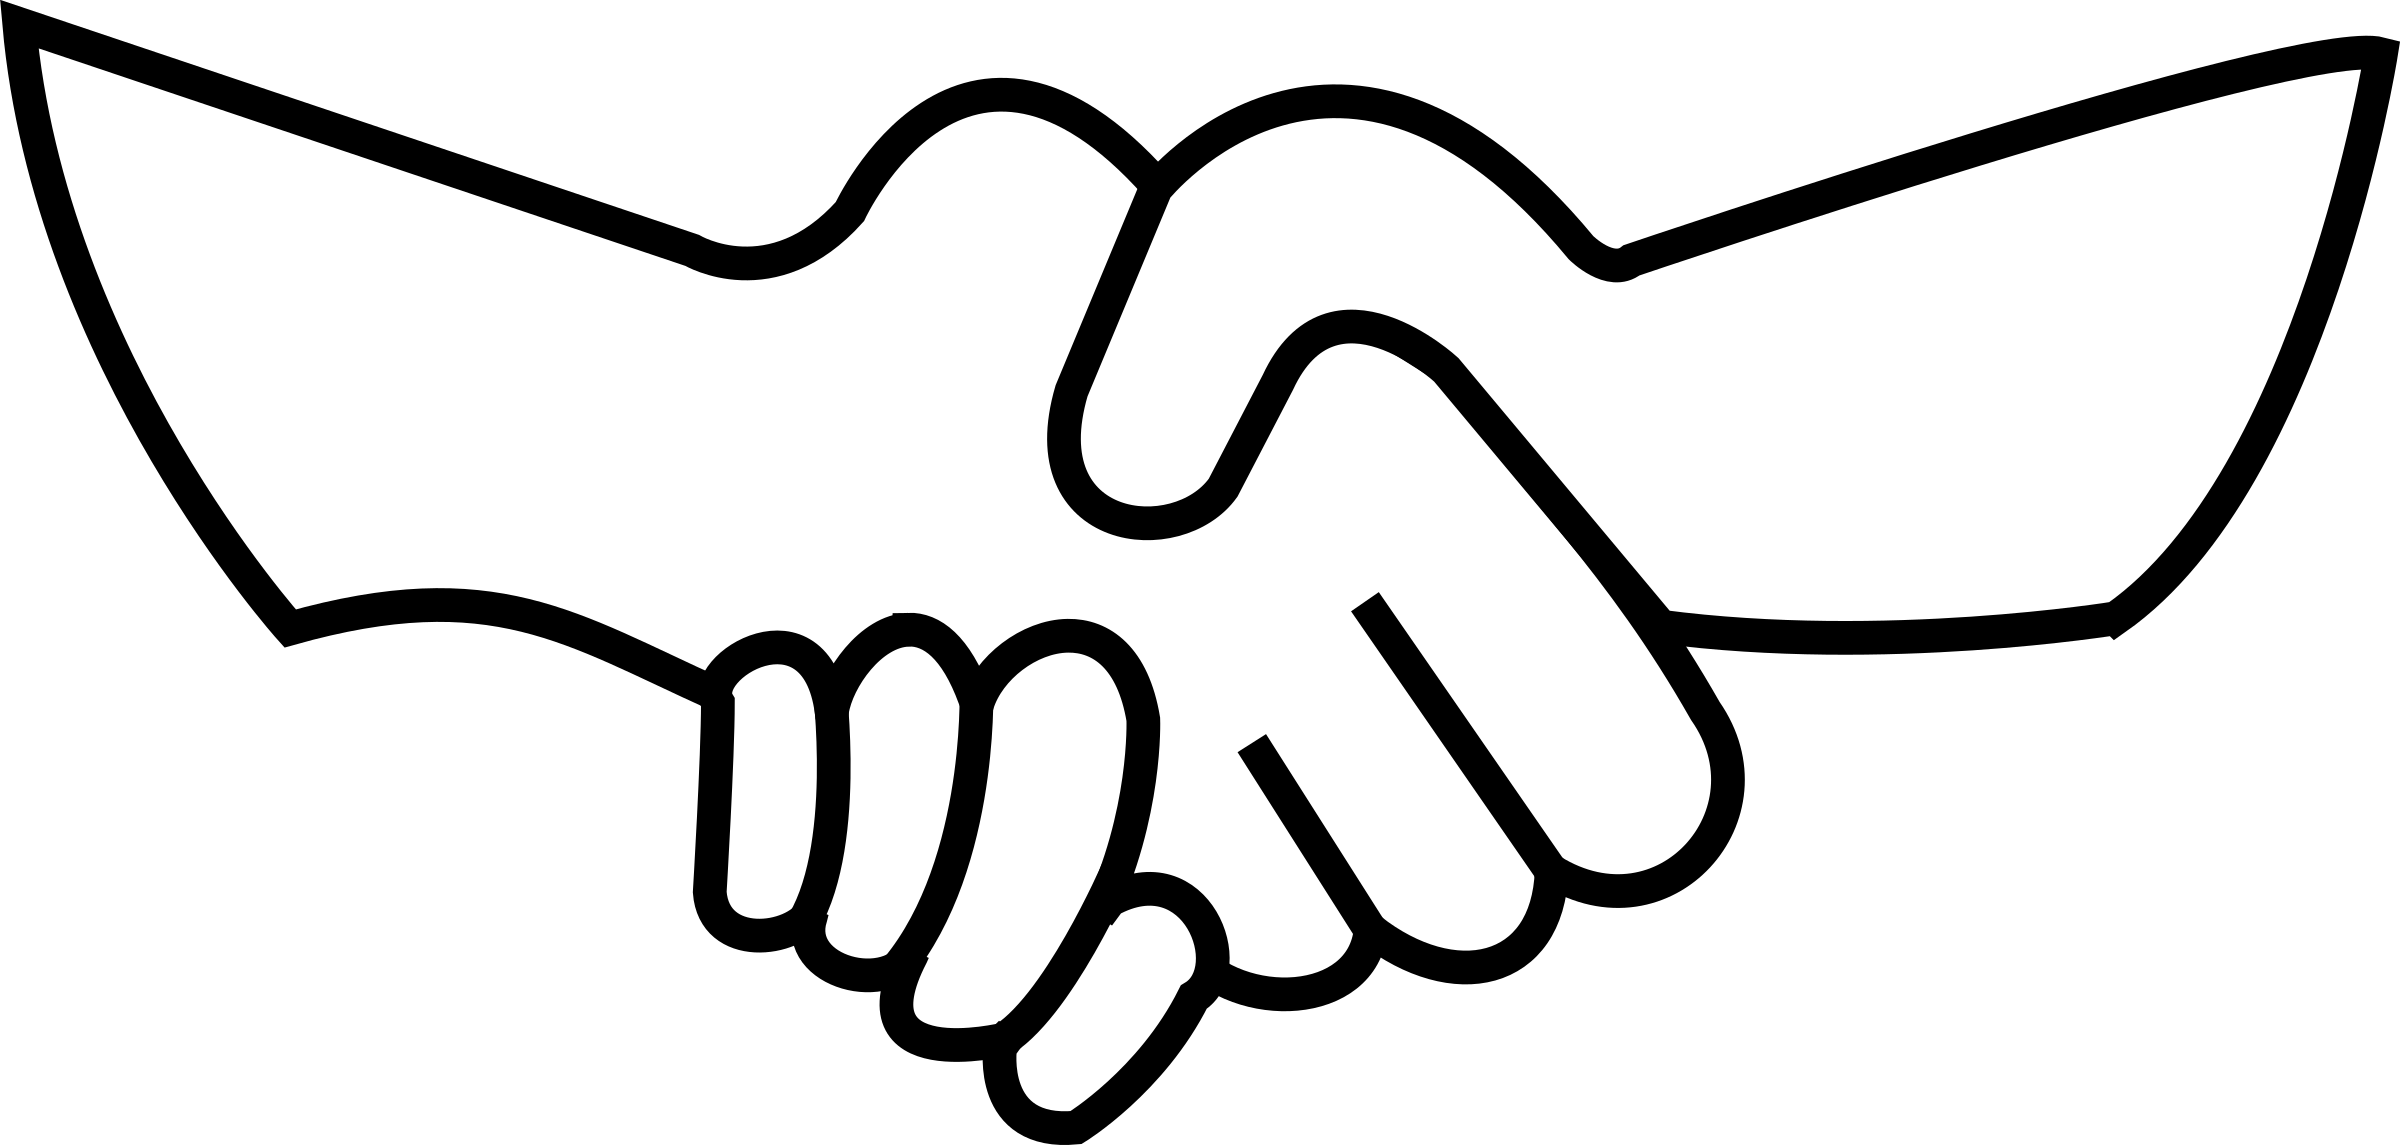 Handshake clipart logo. Big image png